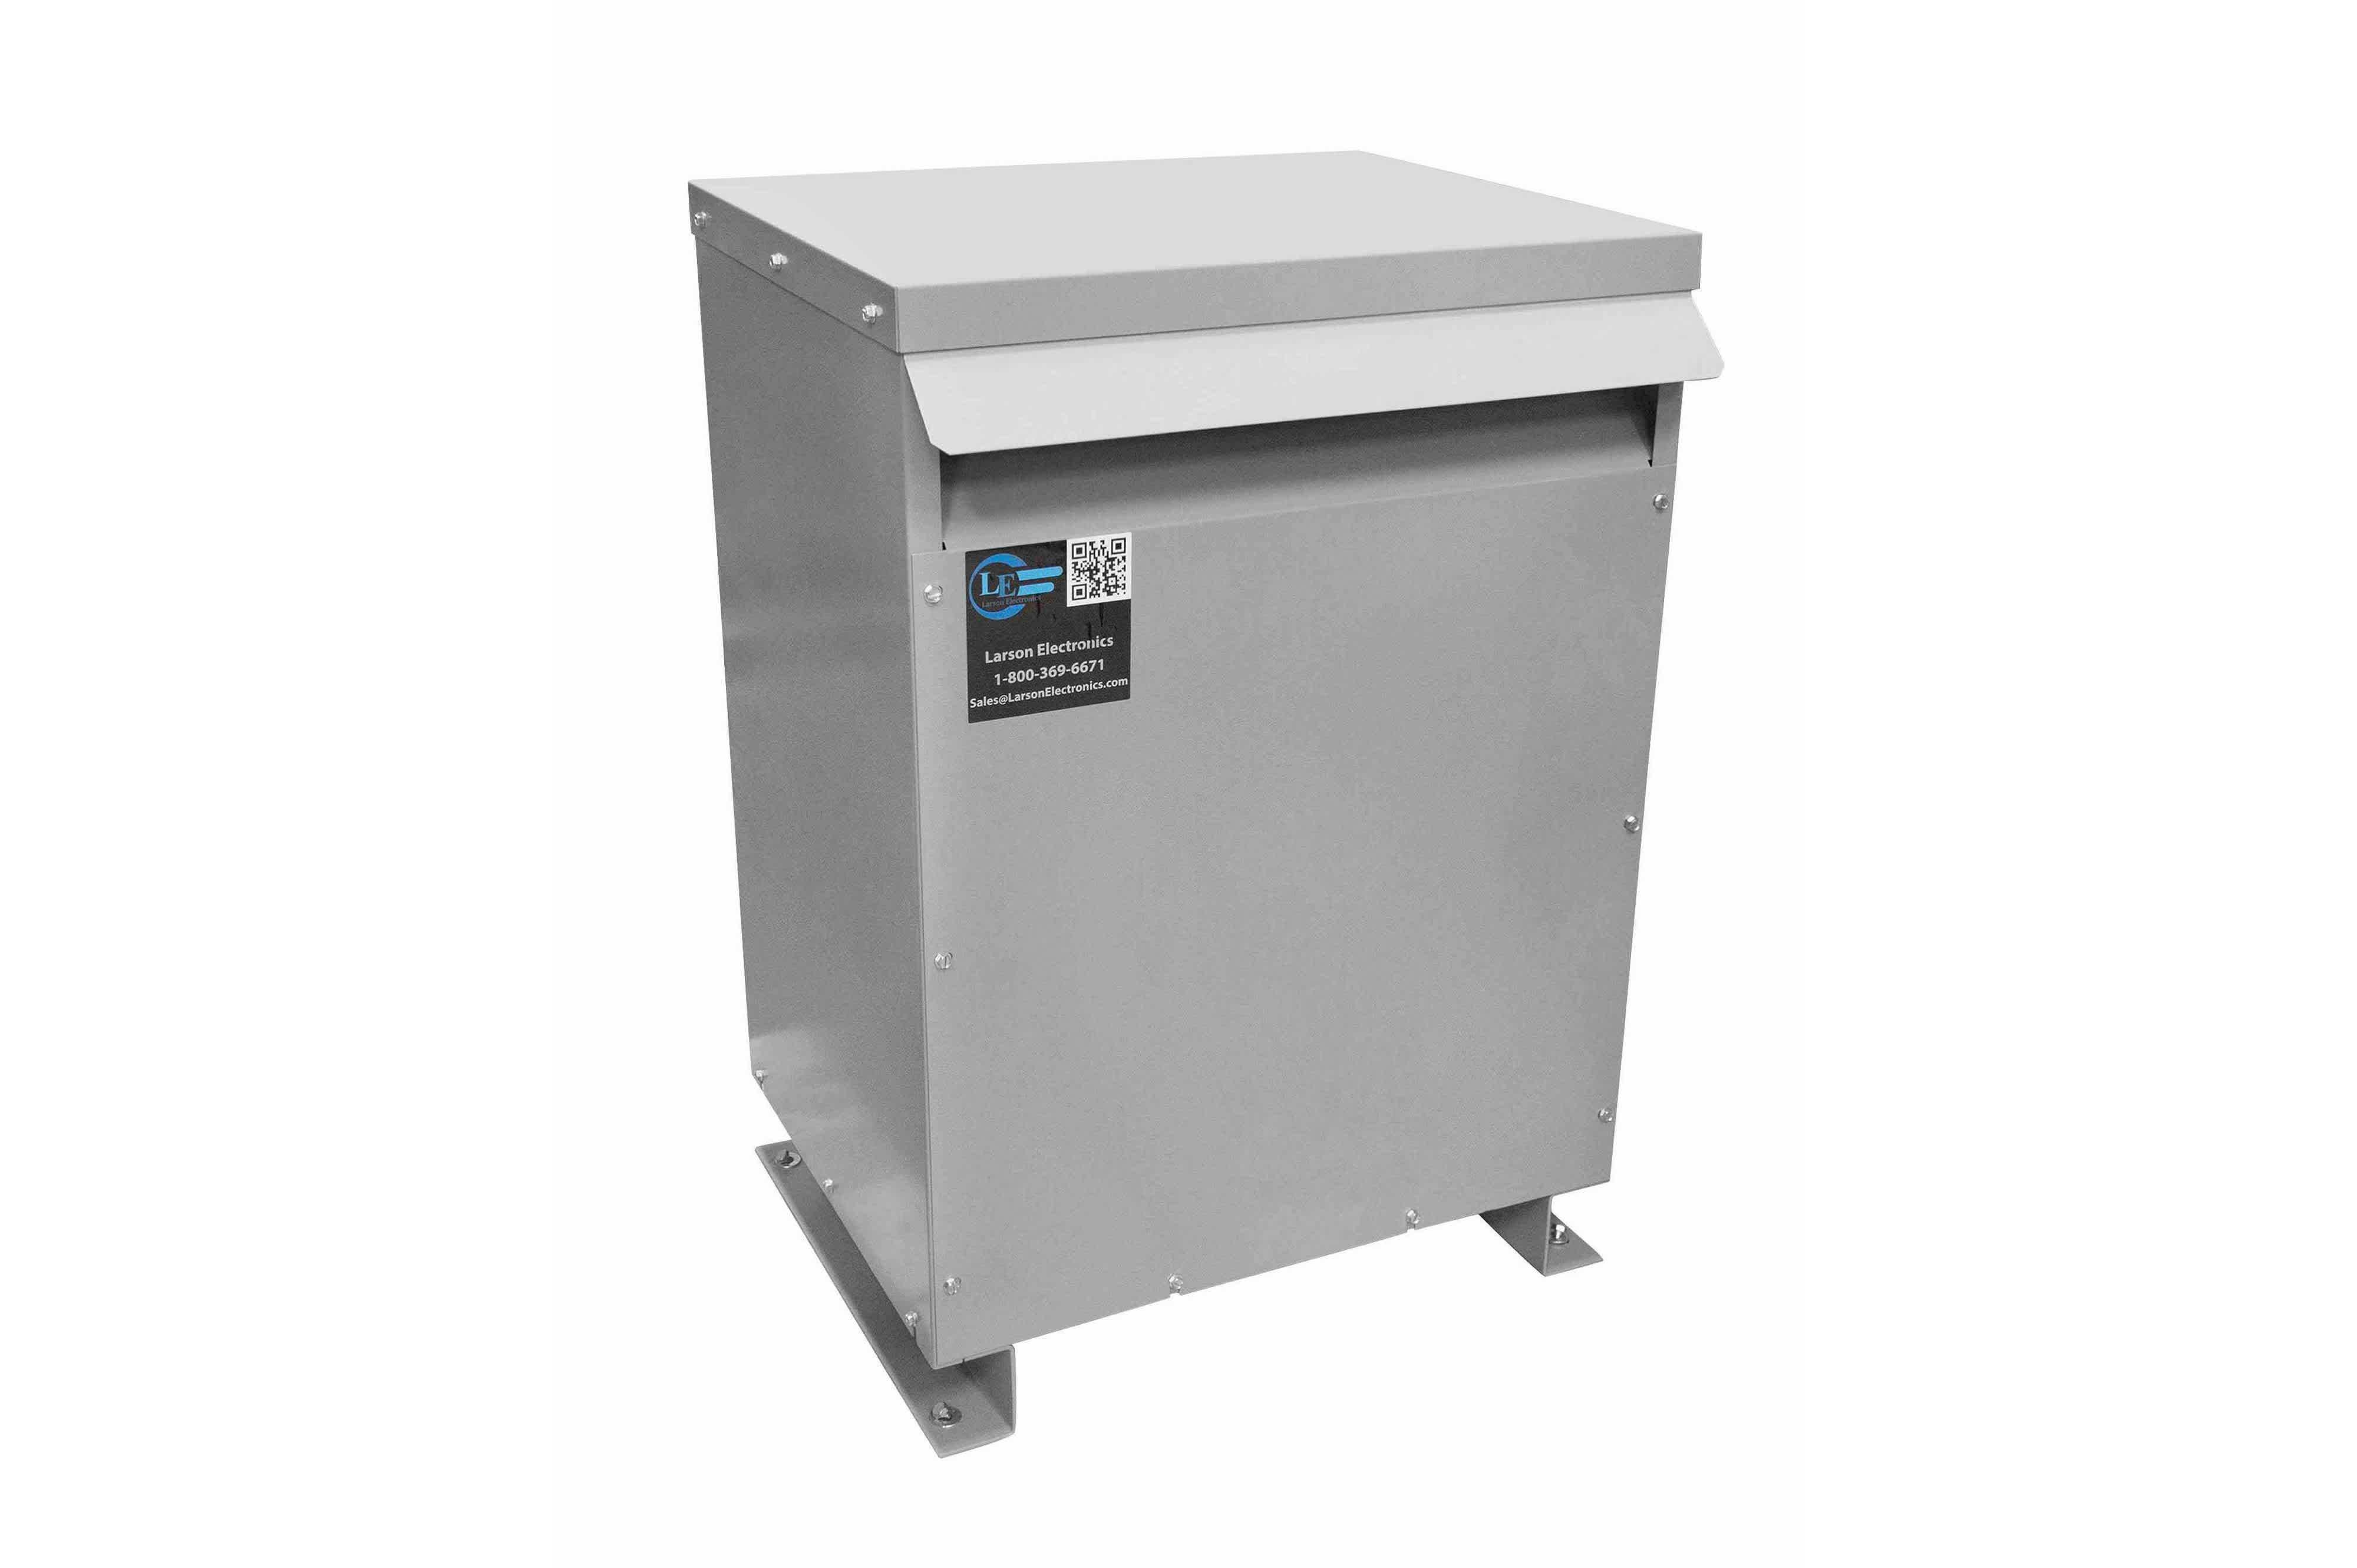 80 kVA 3PH Isolation Transformer, 415V Wye Primary, 480V Delta Secondary, N3R, Ventilated, 60 Hz